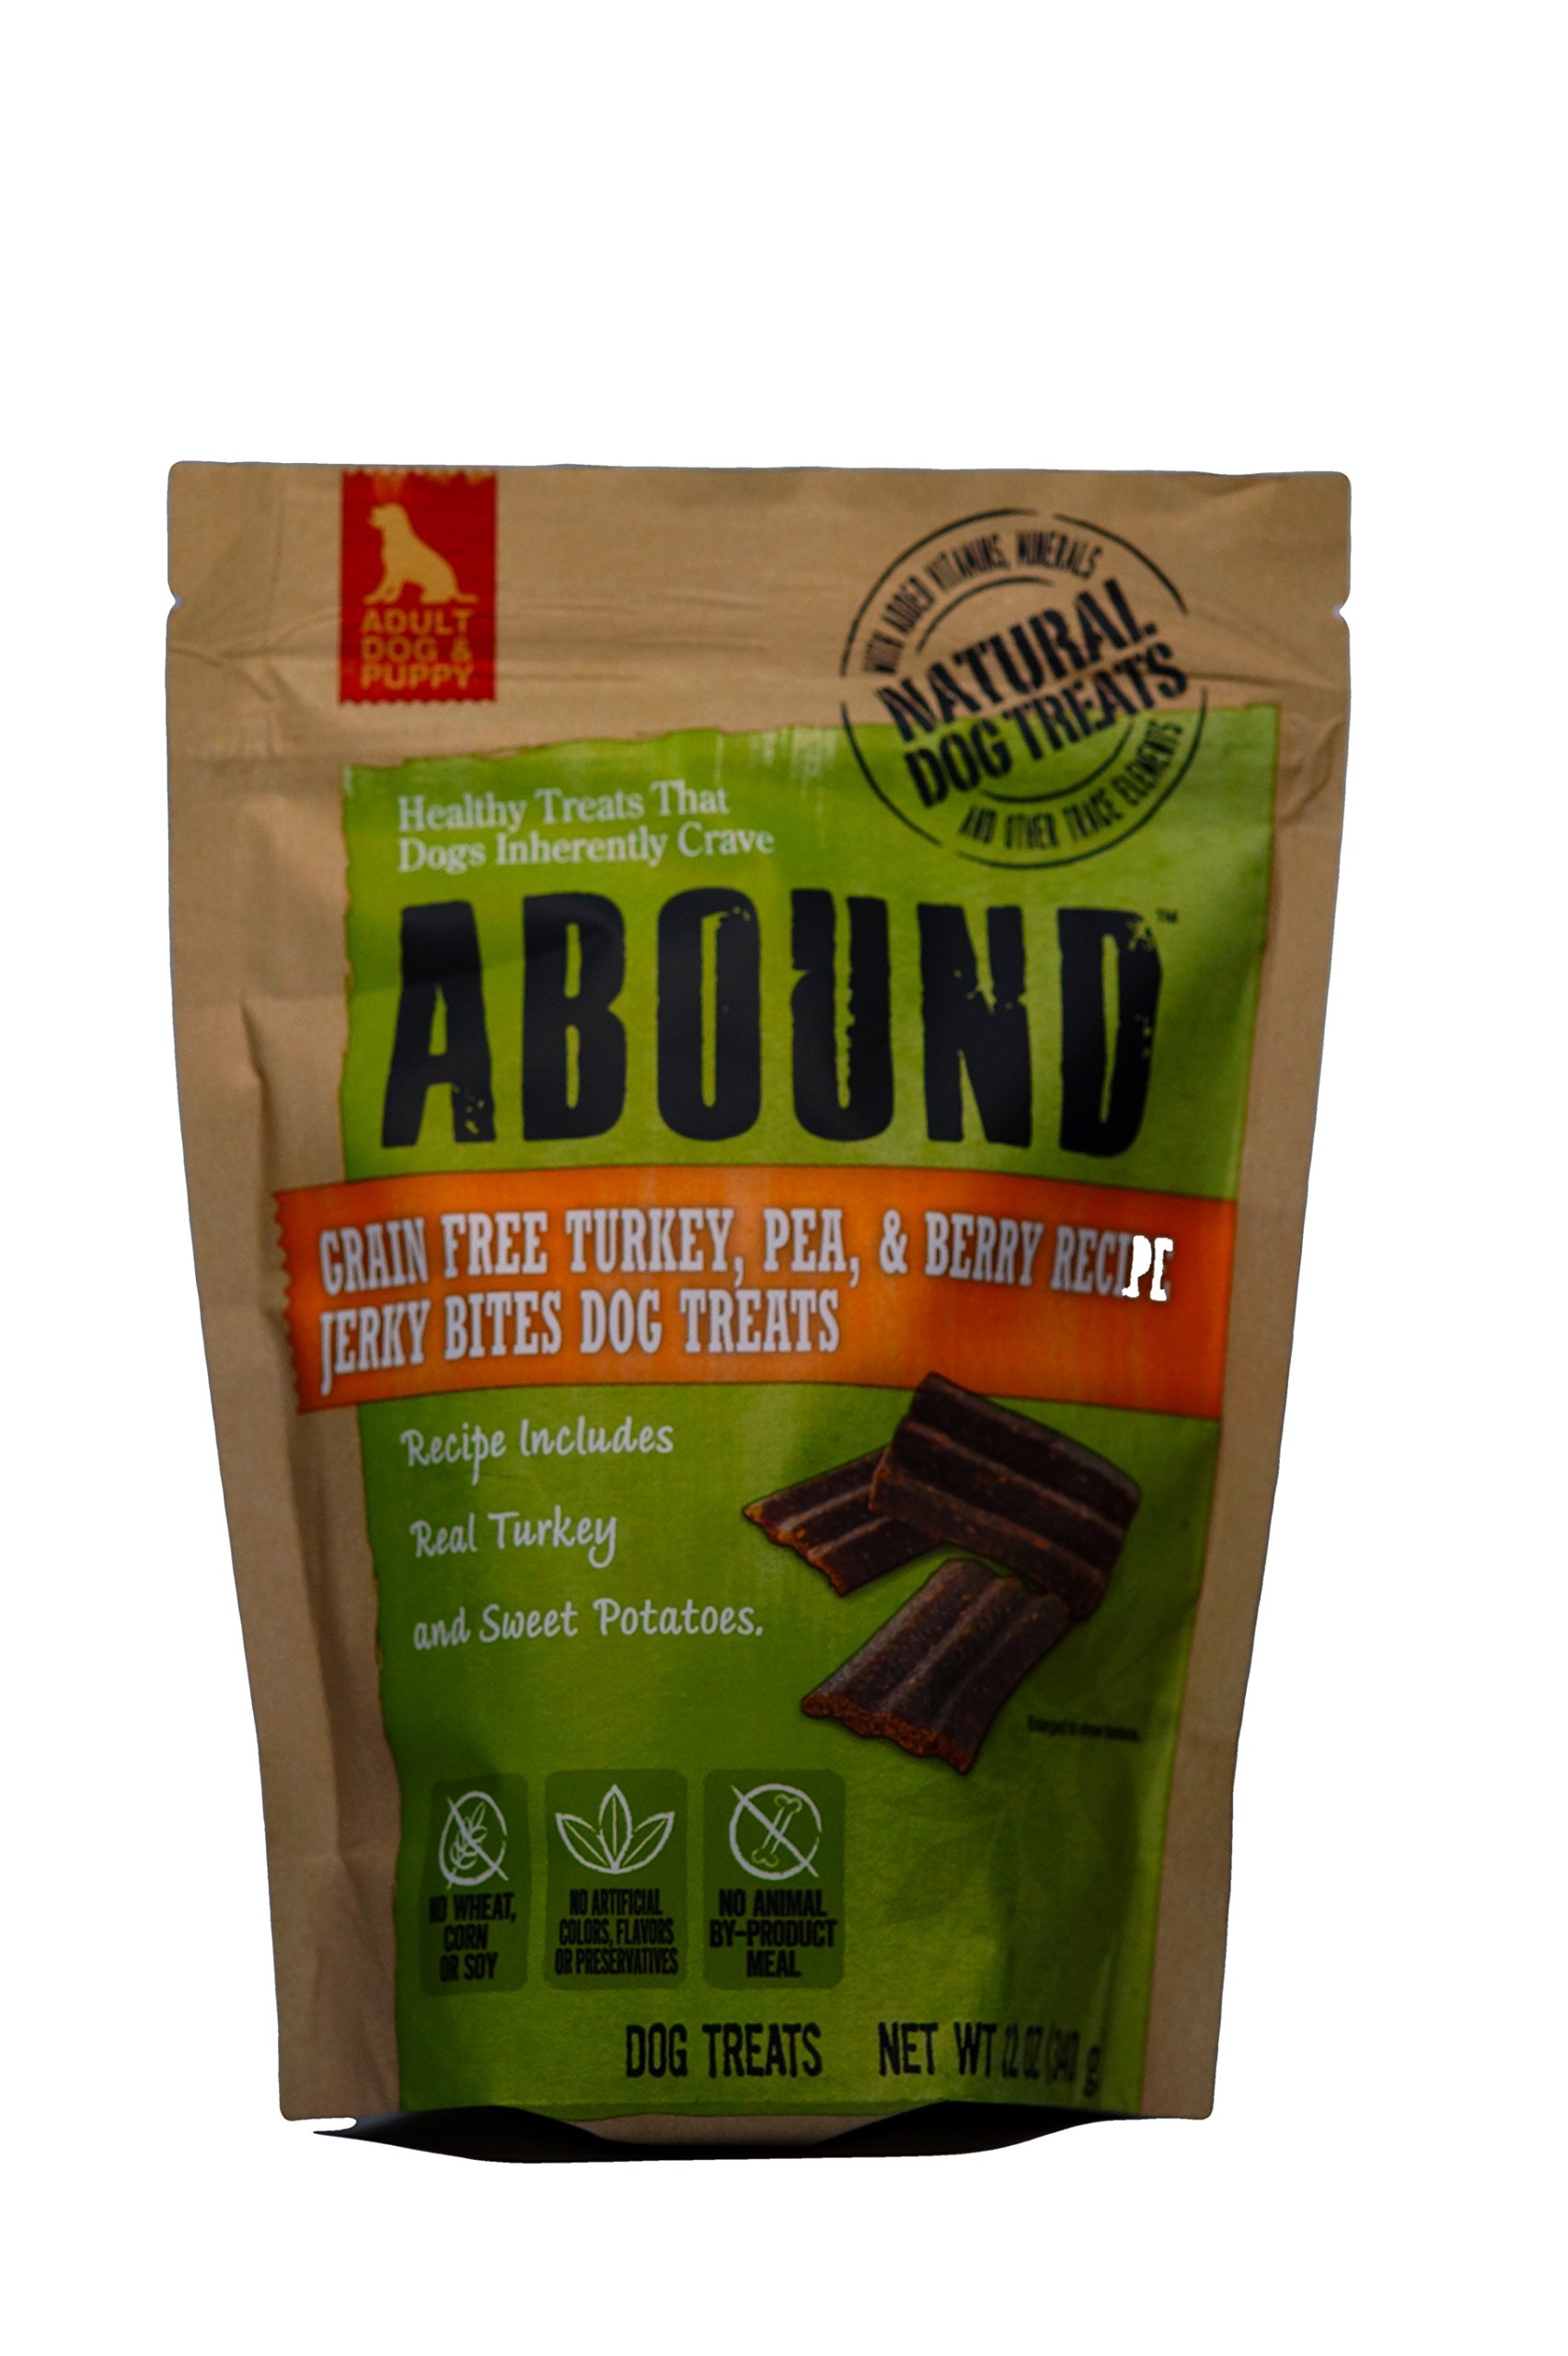 Abound Grain Free Turkey, Pea, & Berry Jerky Bite Dog Treats,12 oz